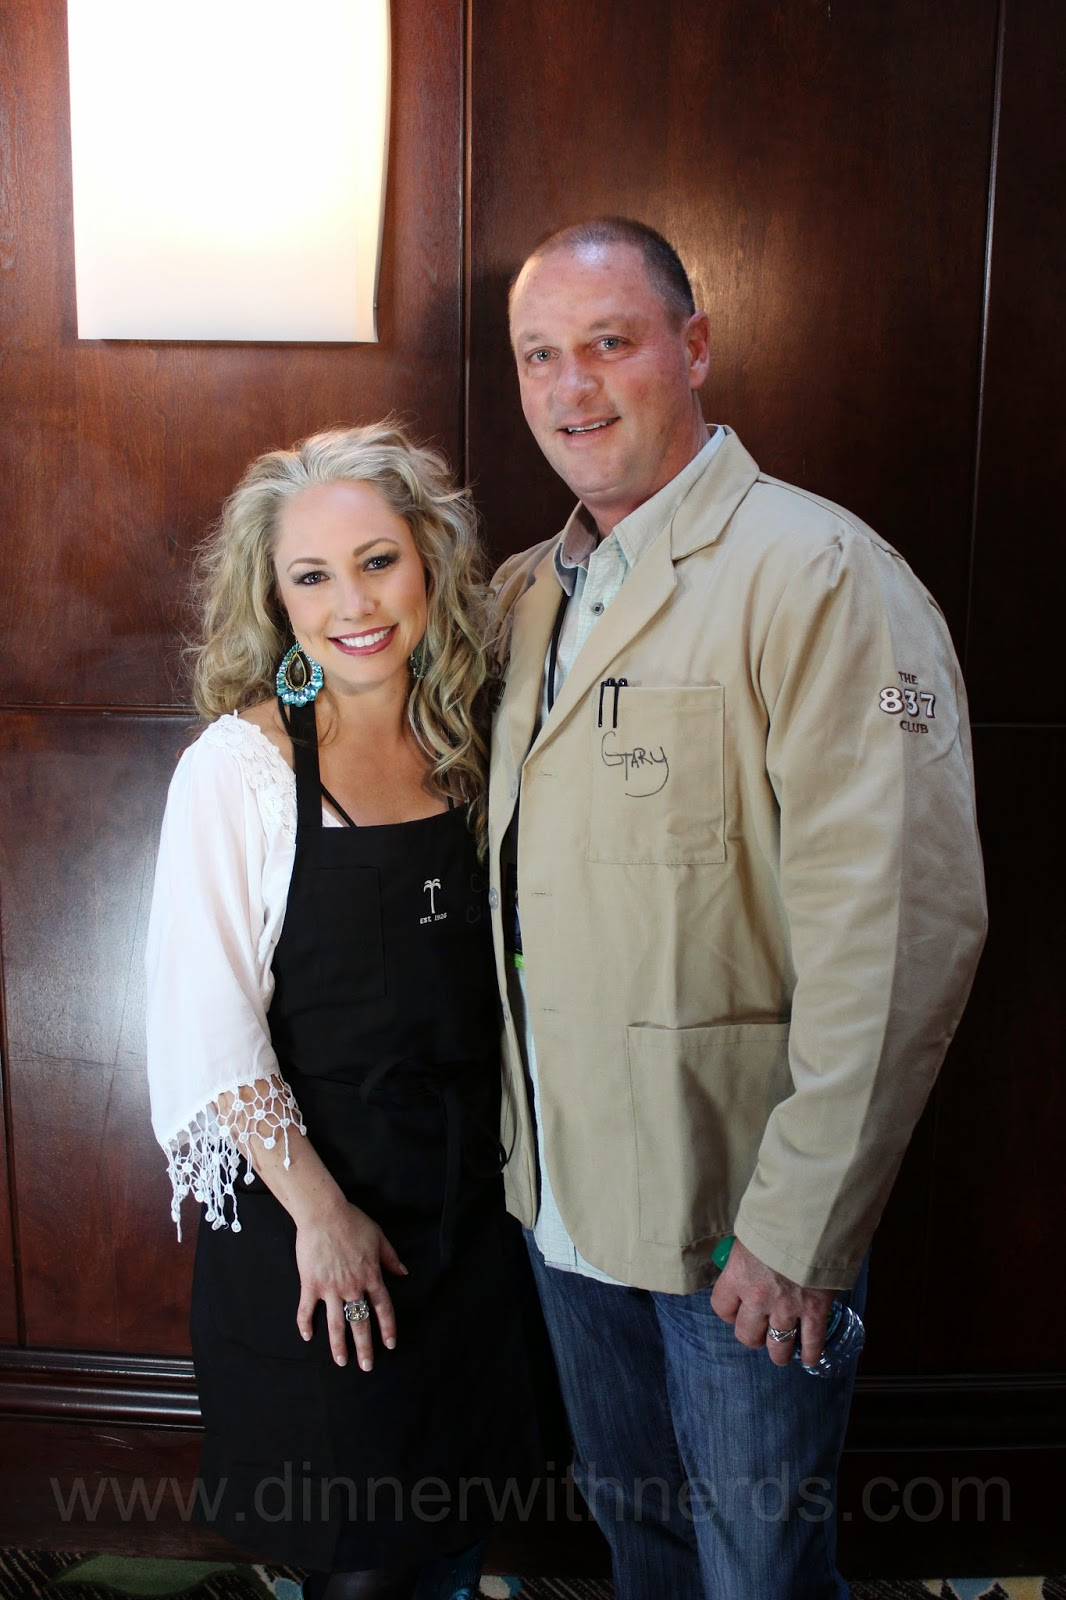 Gary and Cassie Chapman